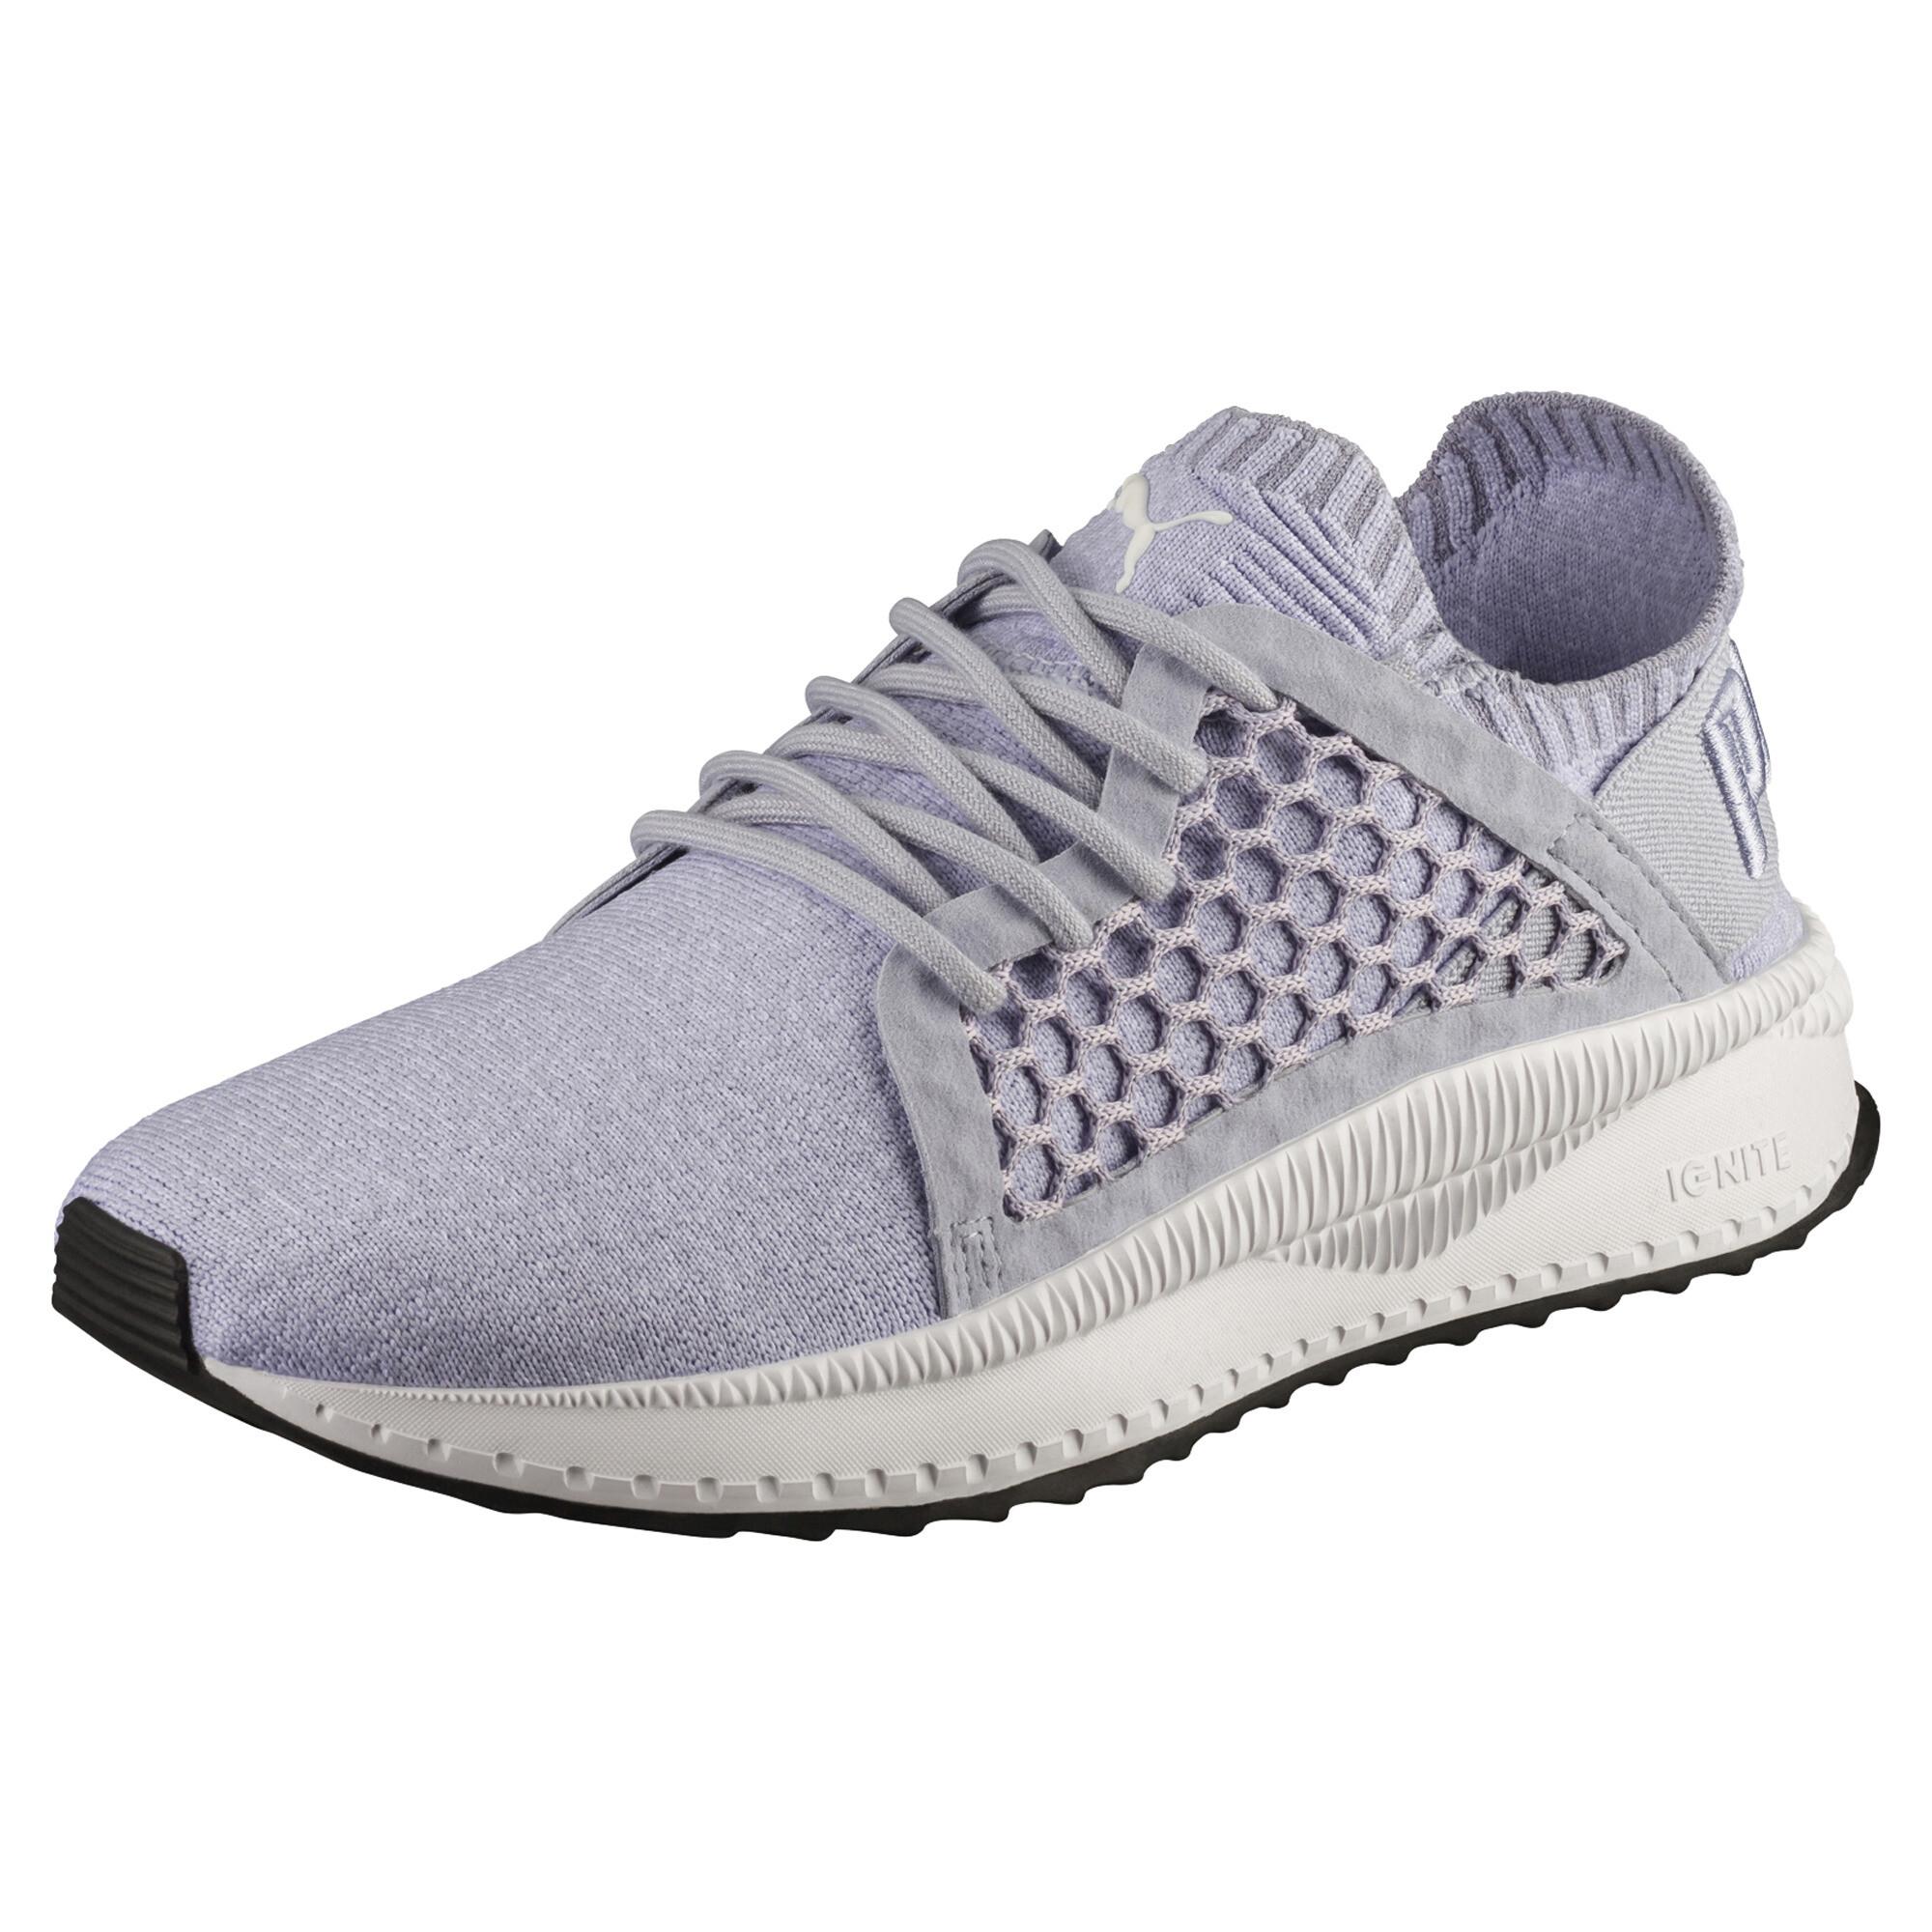 PUMA-TSUGI-NETFIT-evoKNIT-Sneaker-Frauen-Schuhe-Neu Indexbild 9